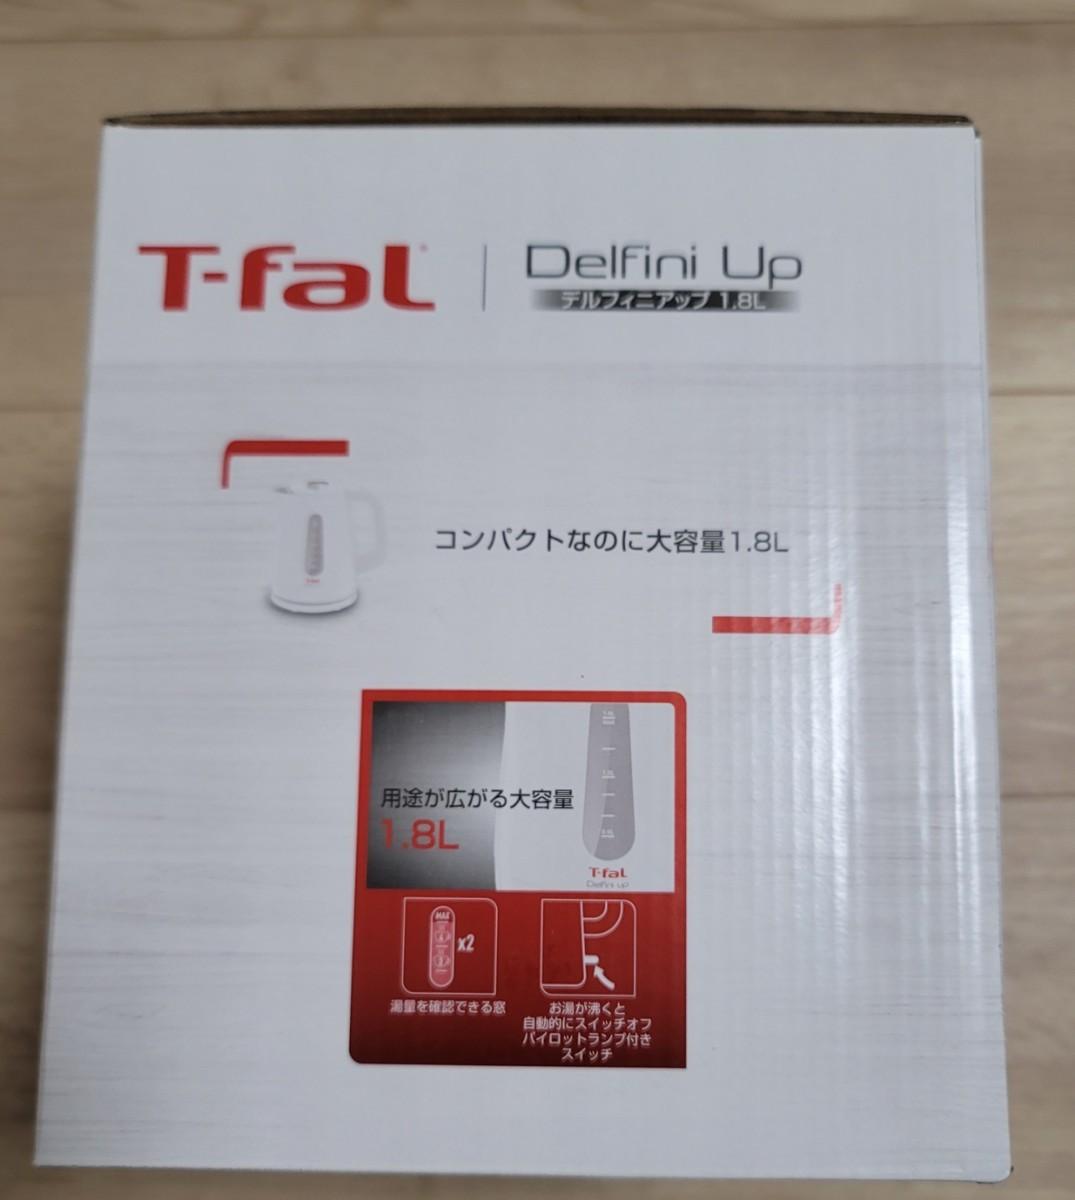 T-Fal 電気ケトル デルフィニアアップ 新品未使用